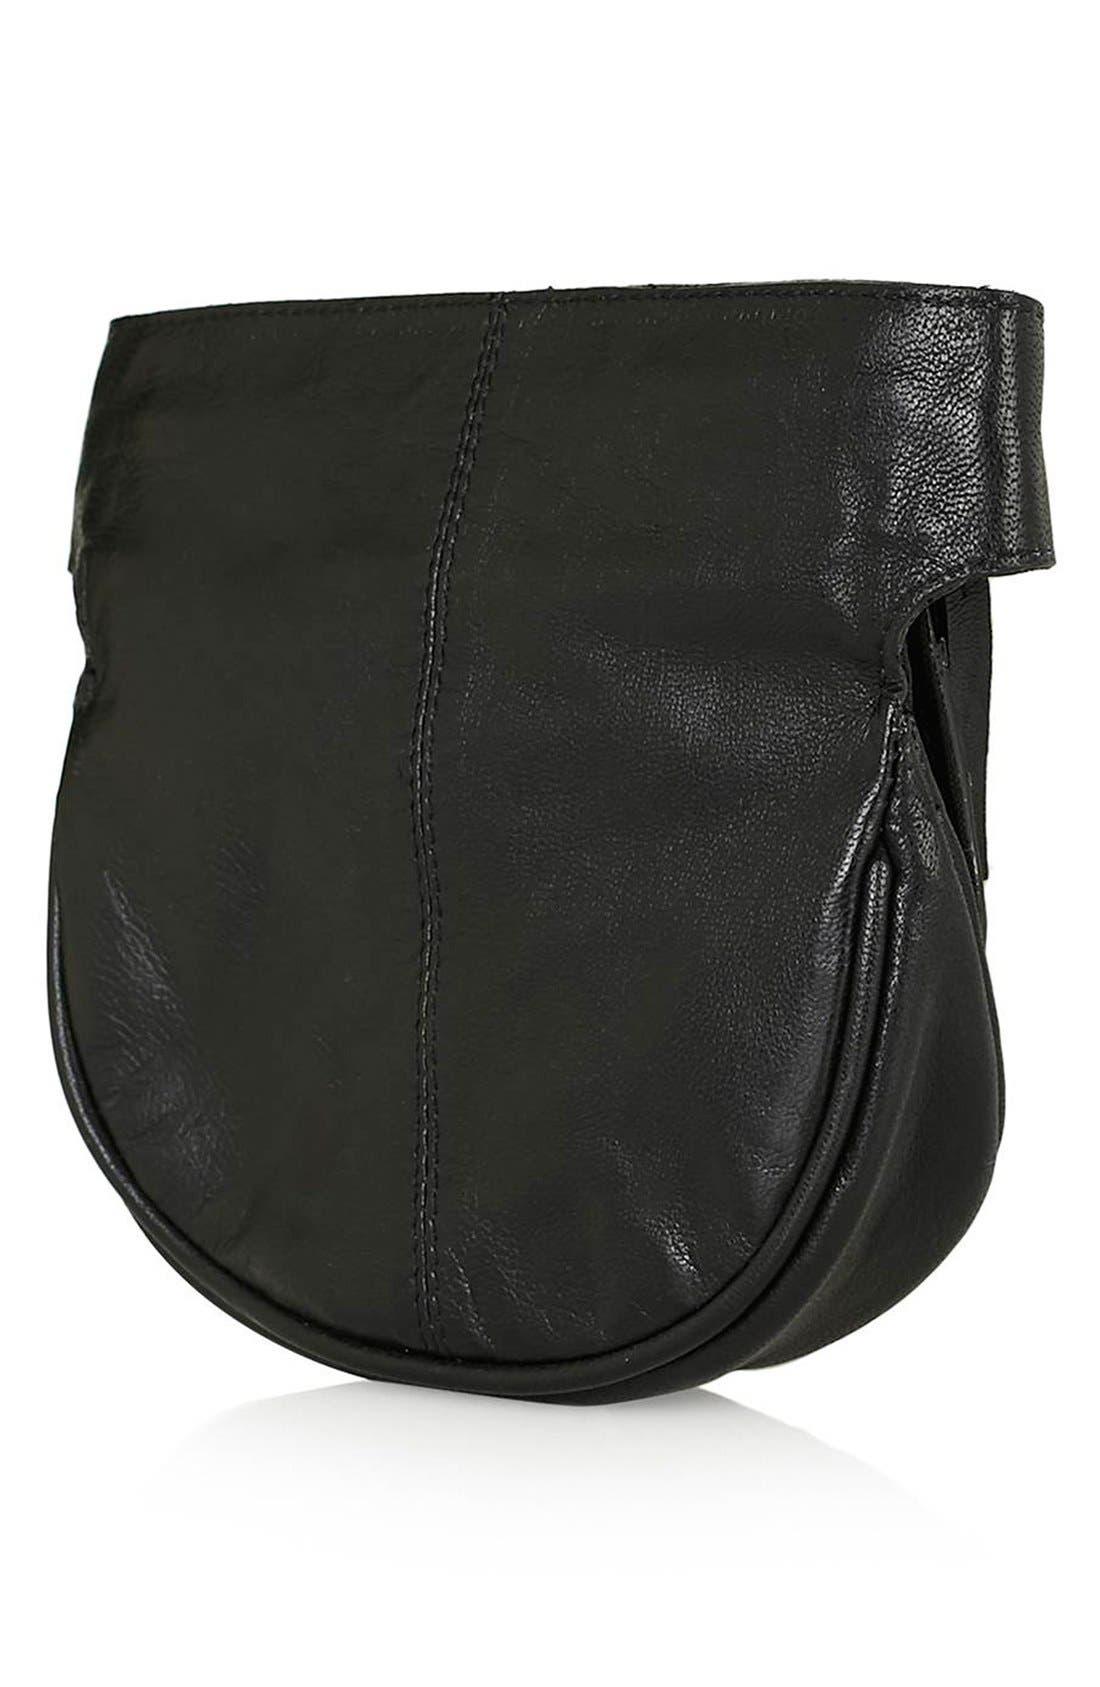 Alternate Image 3  - Topshop Western Leather & Calf Hair Belt Bag